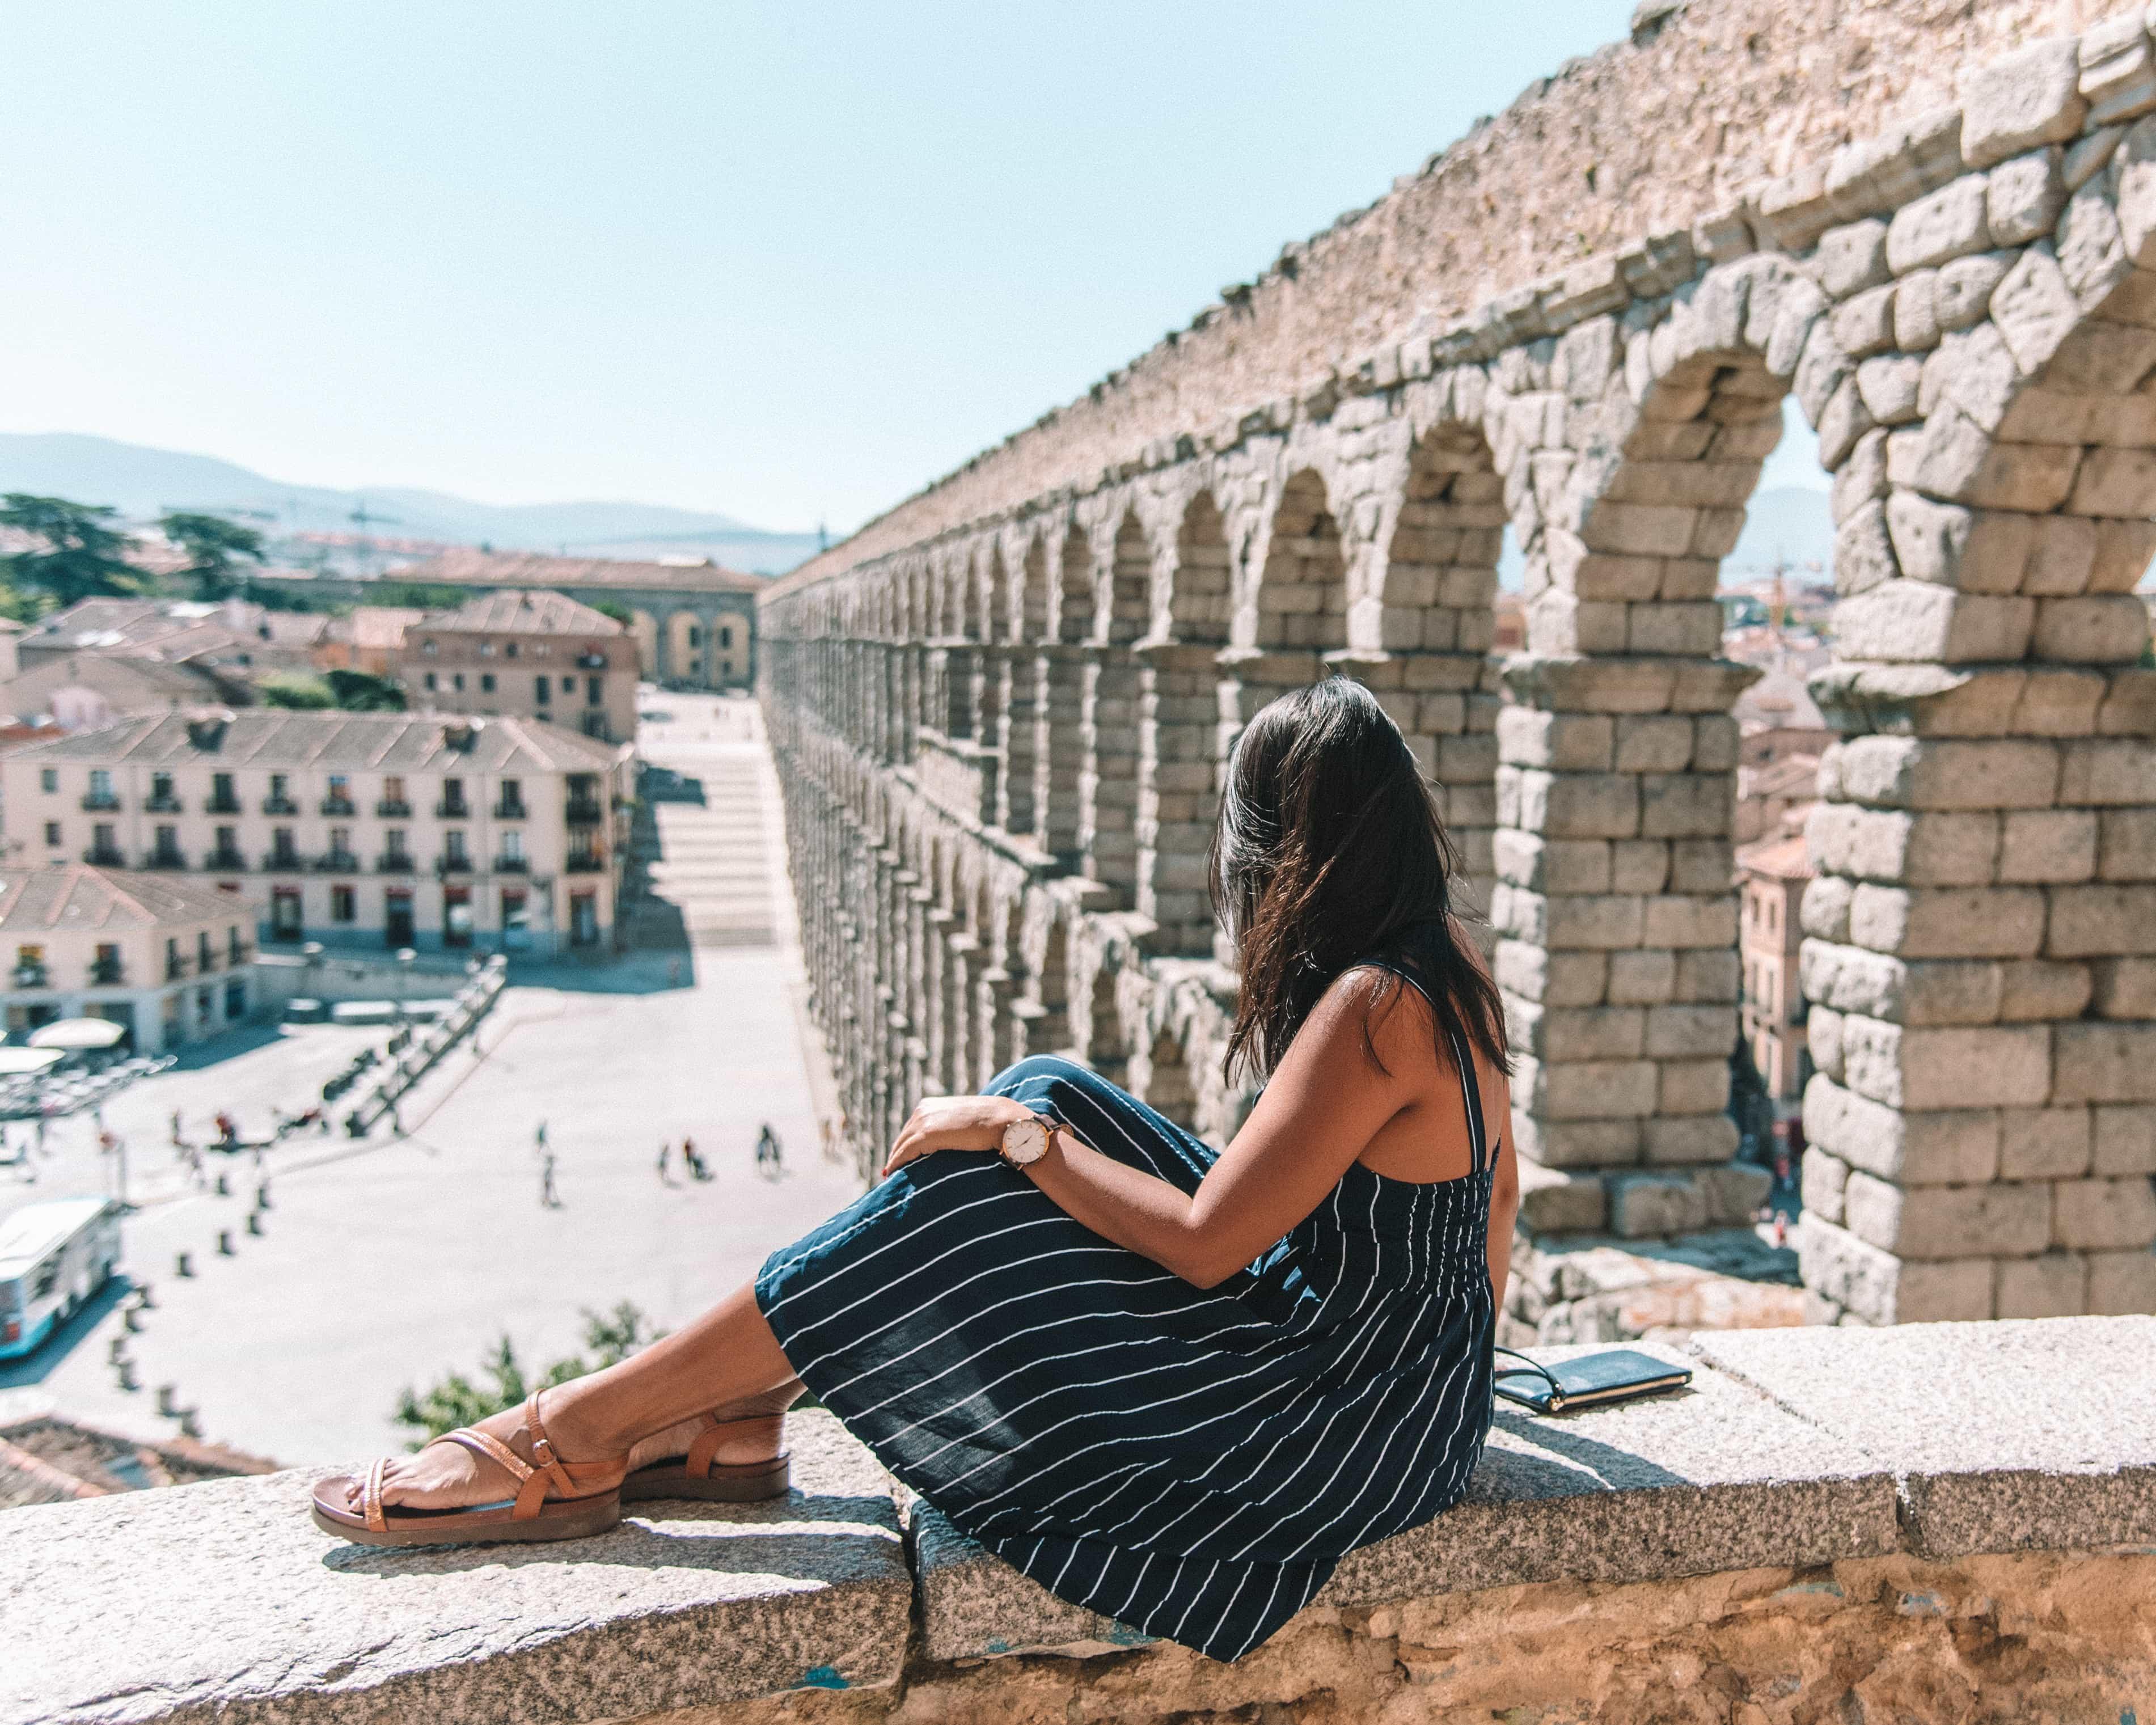 madrid to segovia, madrid to segovia train, madrid to segovia bus, ave train madrid to segovia, distance from madrid to segovia, madrid to segovia by train, how to get to segovia from madrid, bus madrid to segovia, from madrid to segovia, Travel Guide to Segovia: Things to do in Segovia, best time to visit Segovia, day tour from Madrid to Segovia, food to try in Segovia, eat cochinillo in Segovia